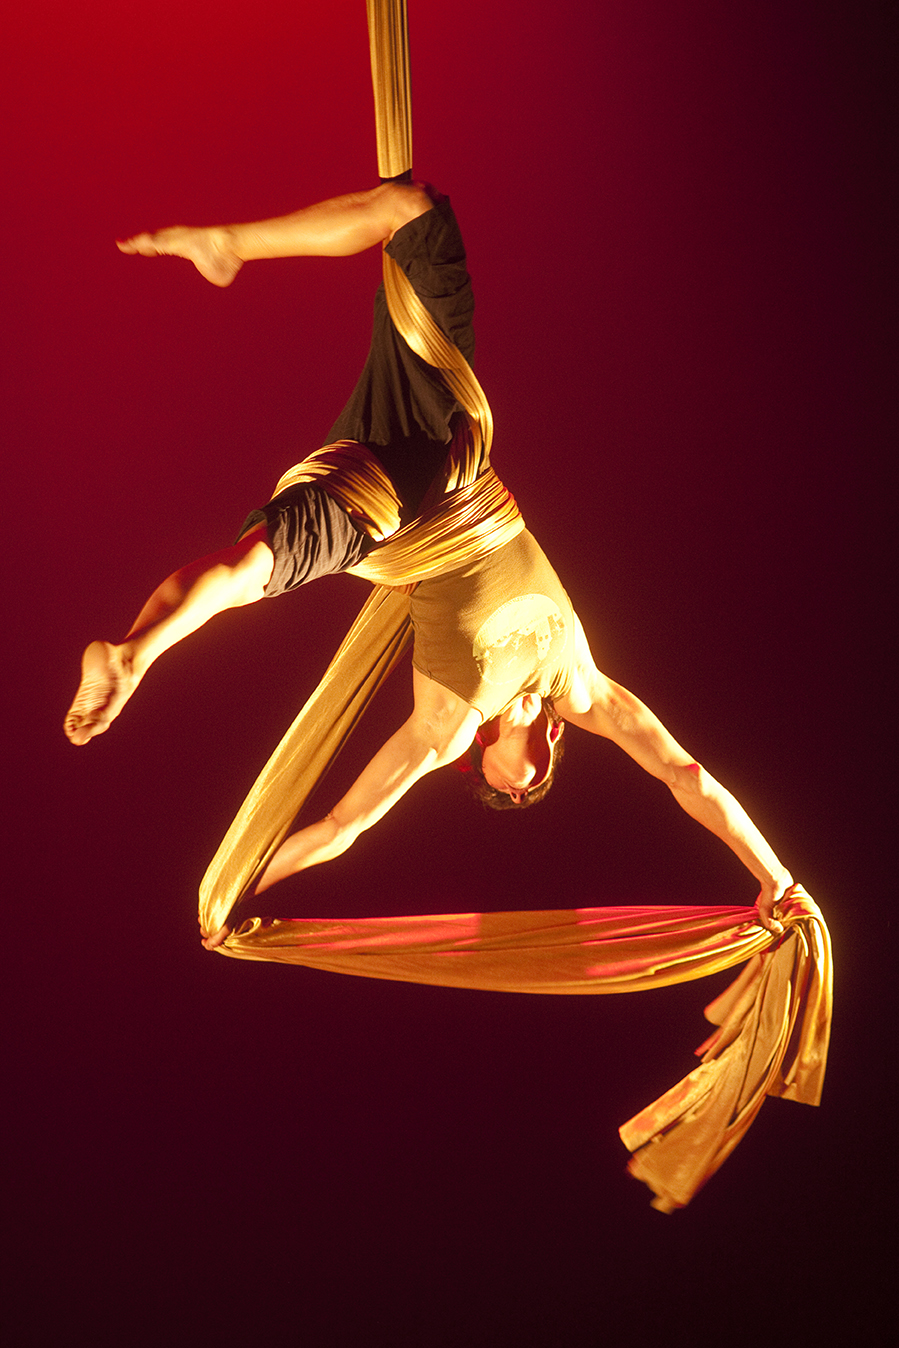 ensayo glazz bailarina copy.jpg